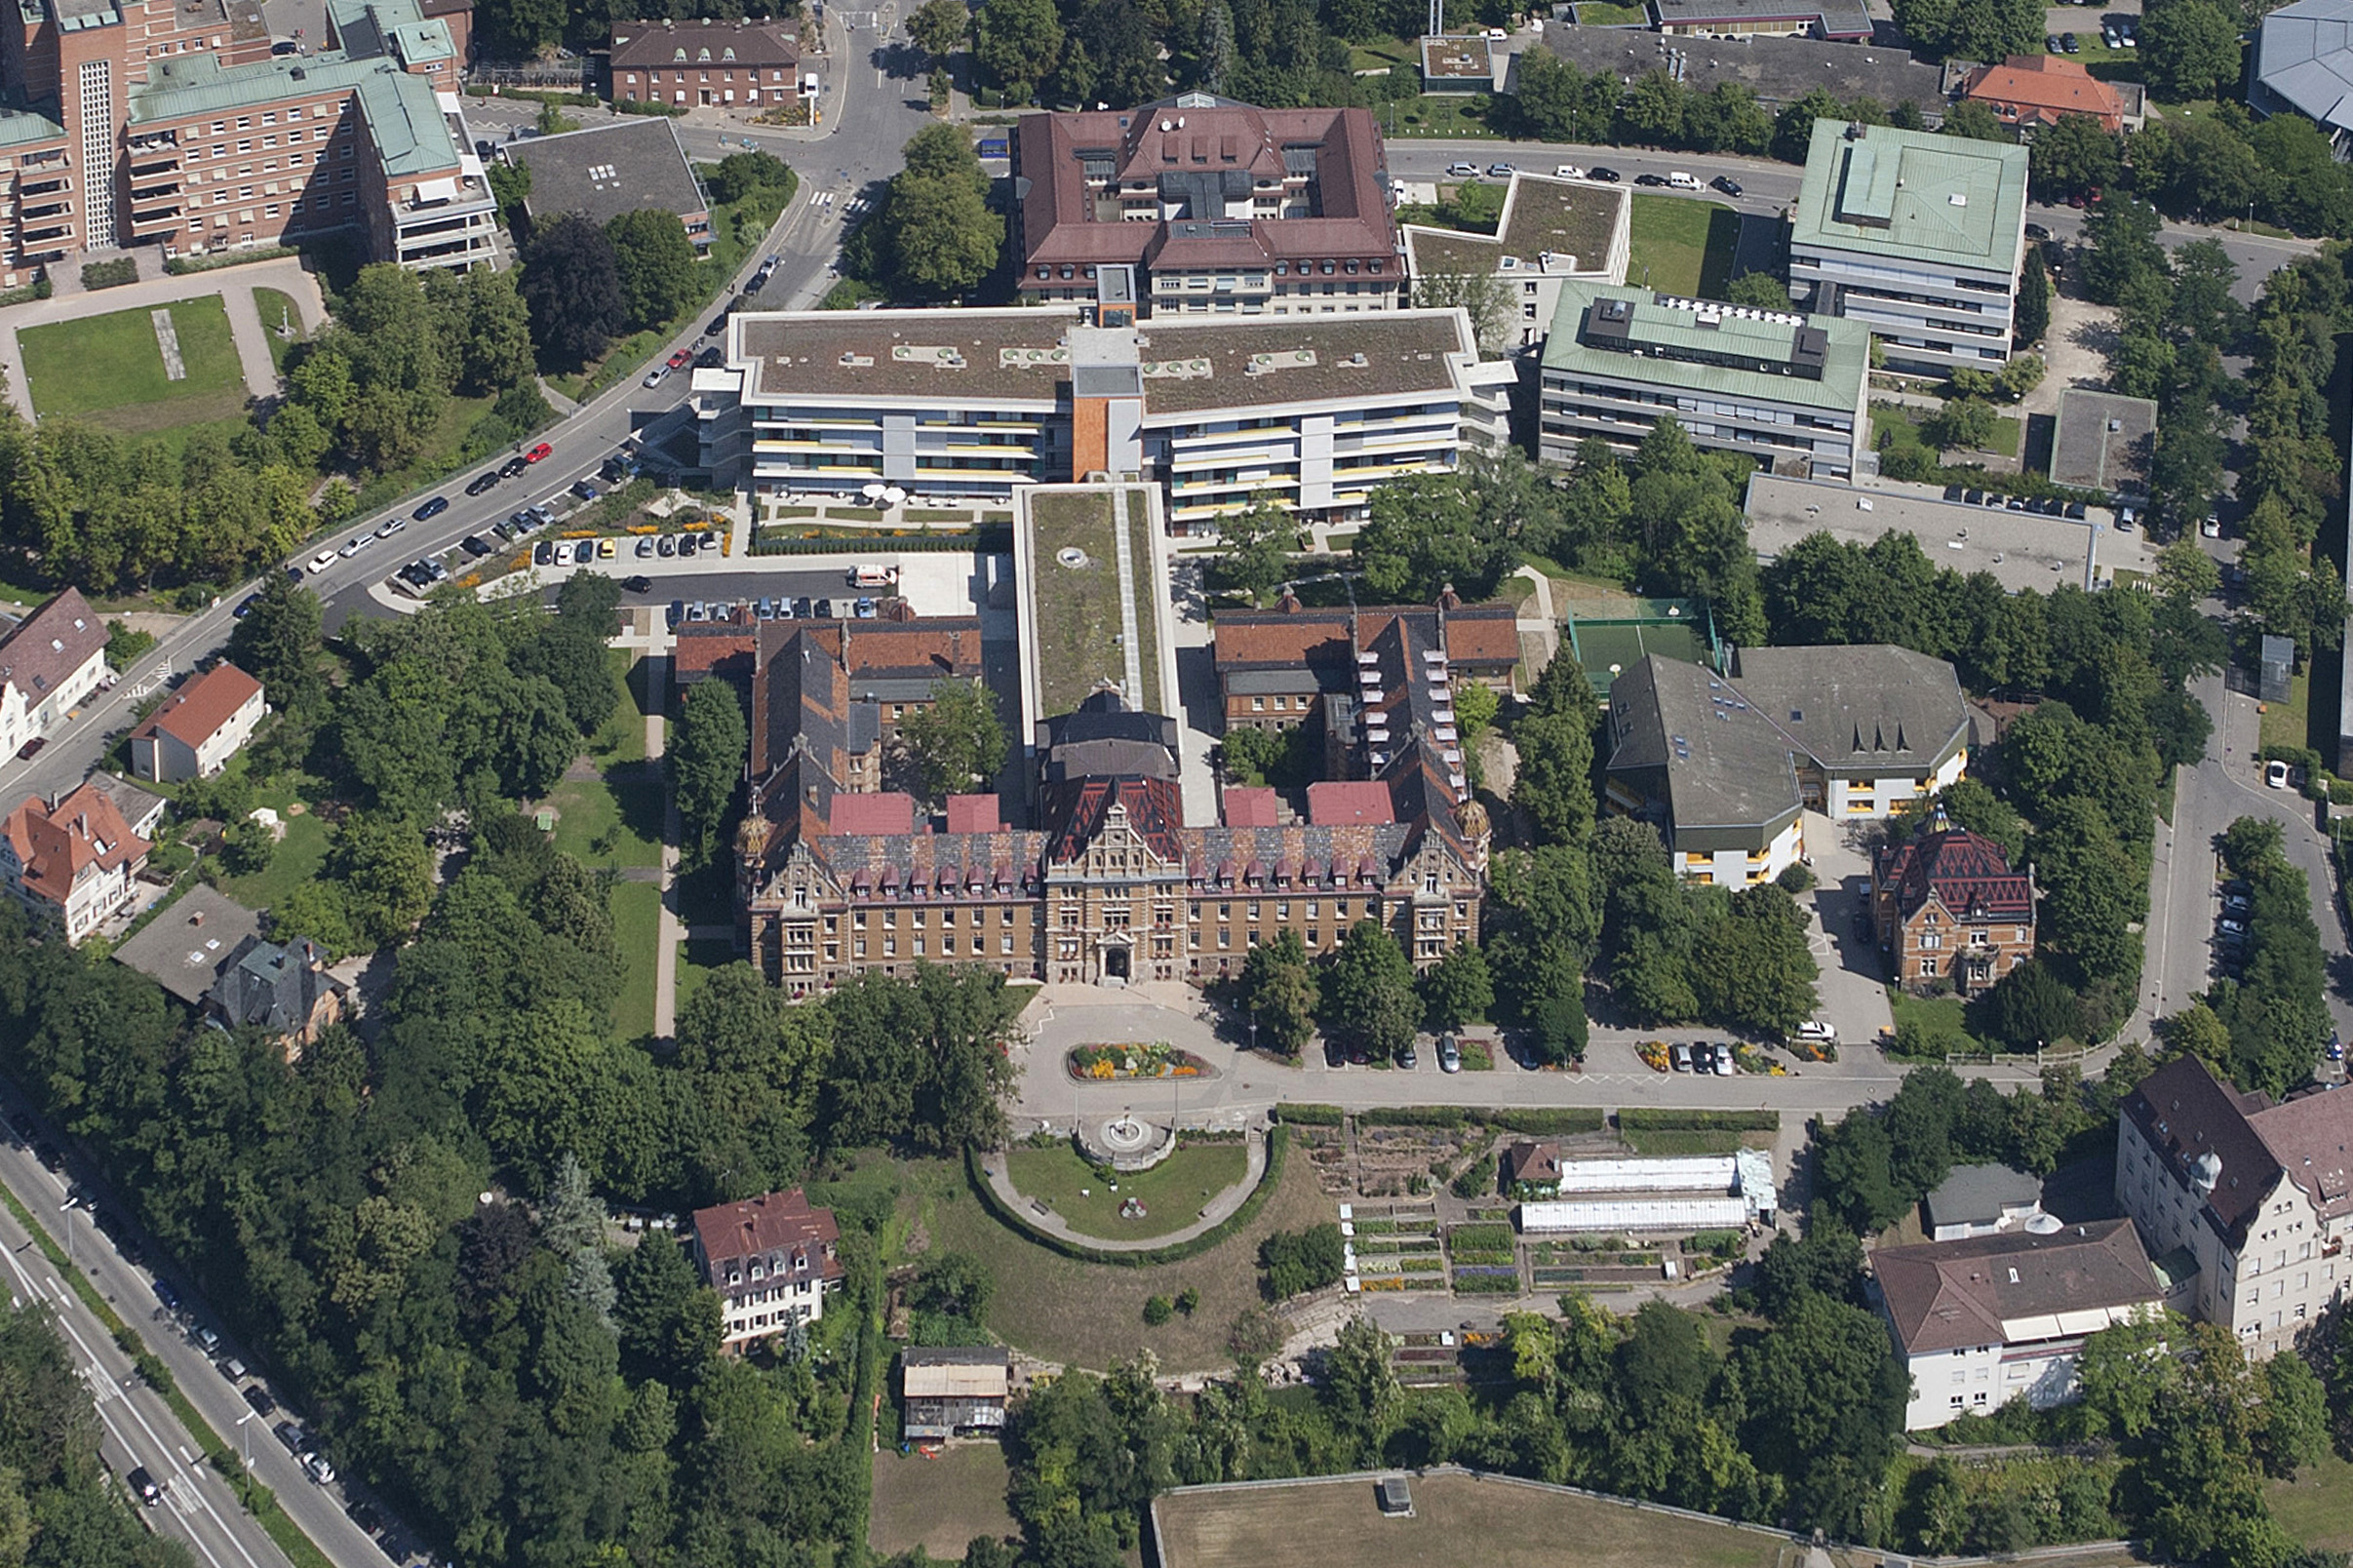 Universitätsklinikum Tübingen 2016 03 24